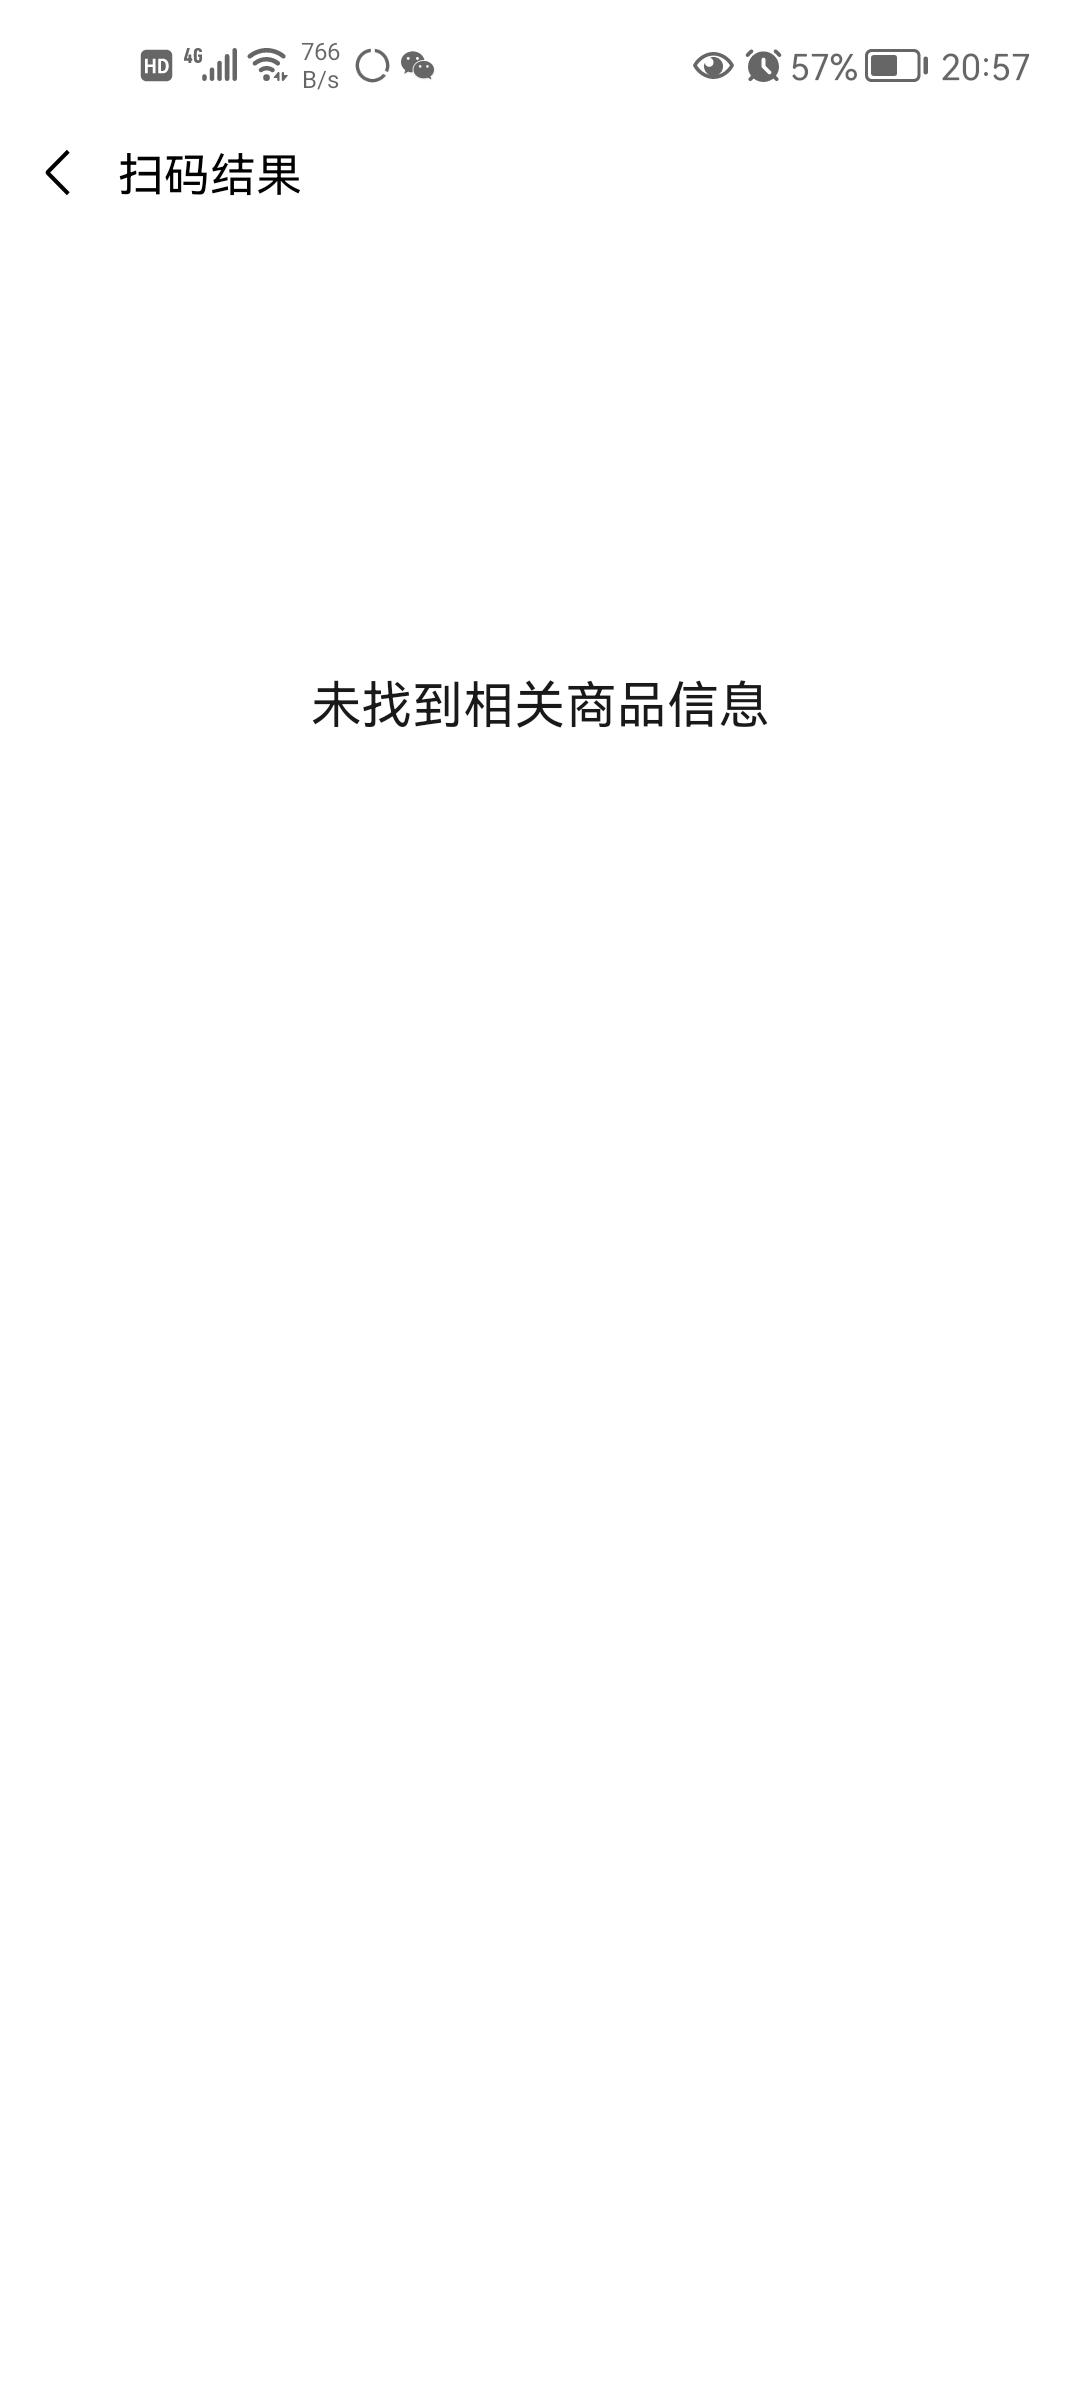 Screenshot_20210828_205715_com.tencent.mm.jpg